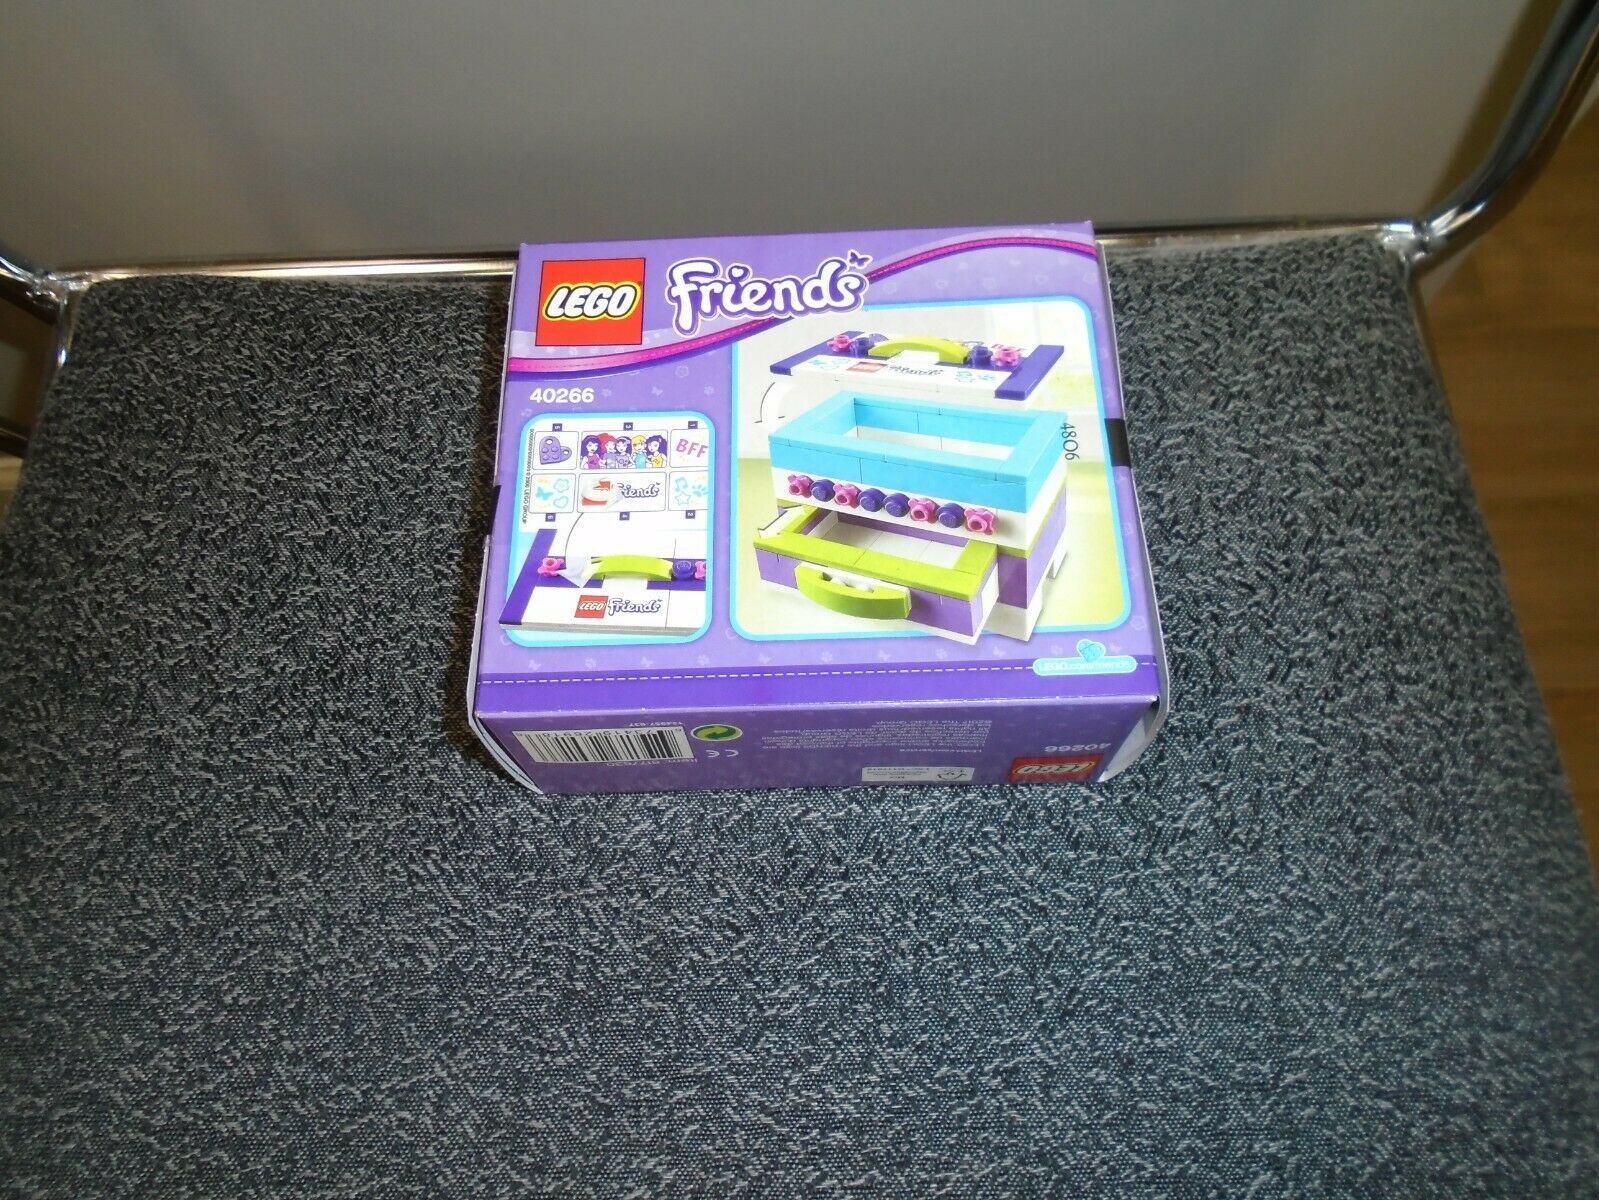 105 pcs. Lego Set 40266 Storage Jewelry Box Friends Limited Edition NIP 2017